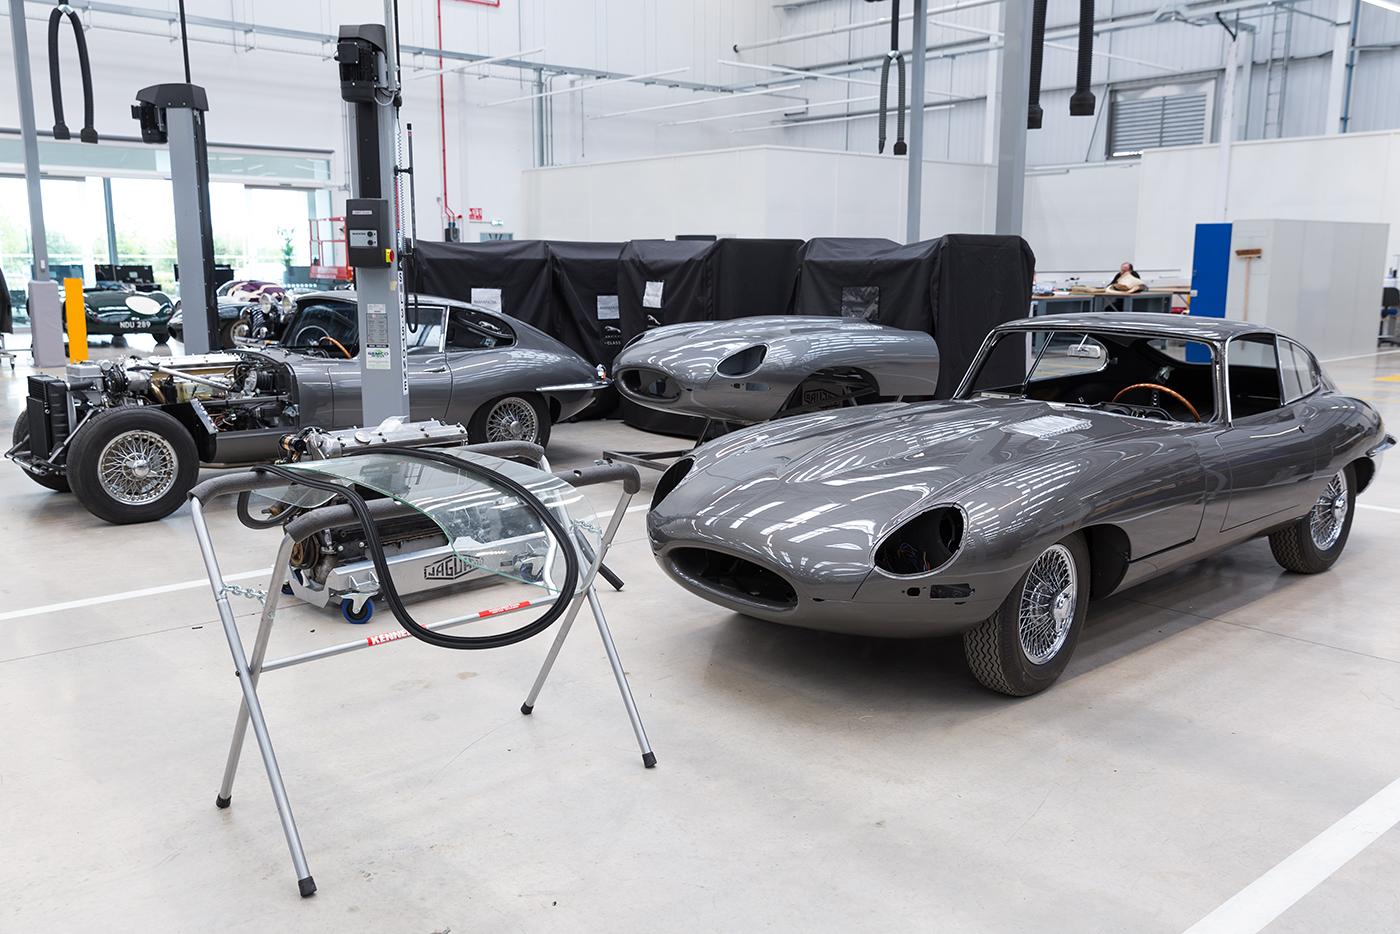 jaguar-land-rover-classic-works-3.jpg